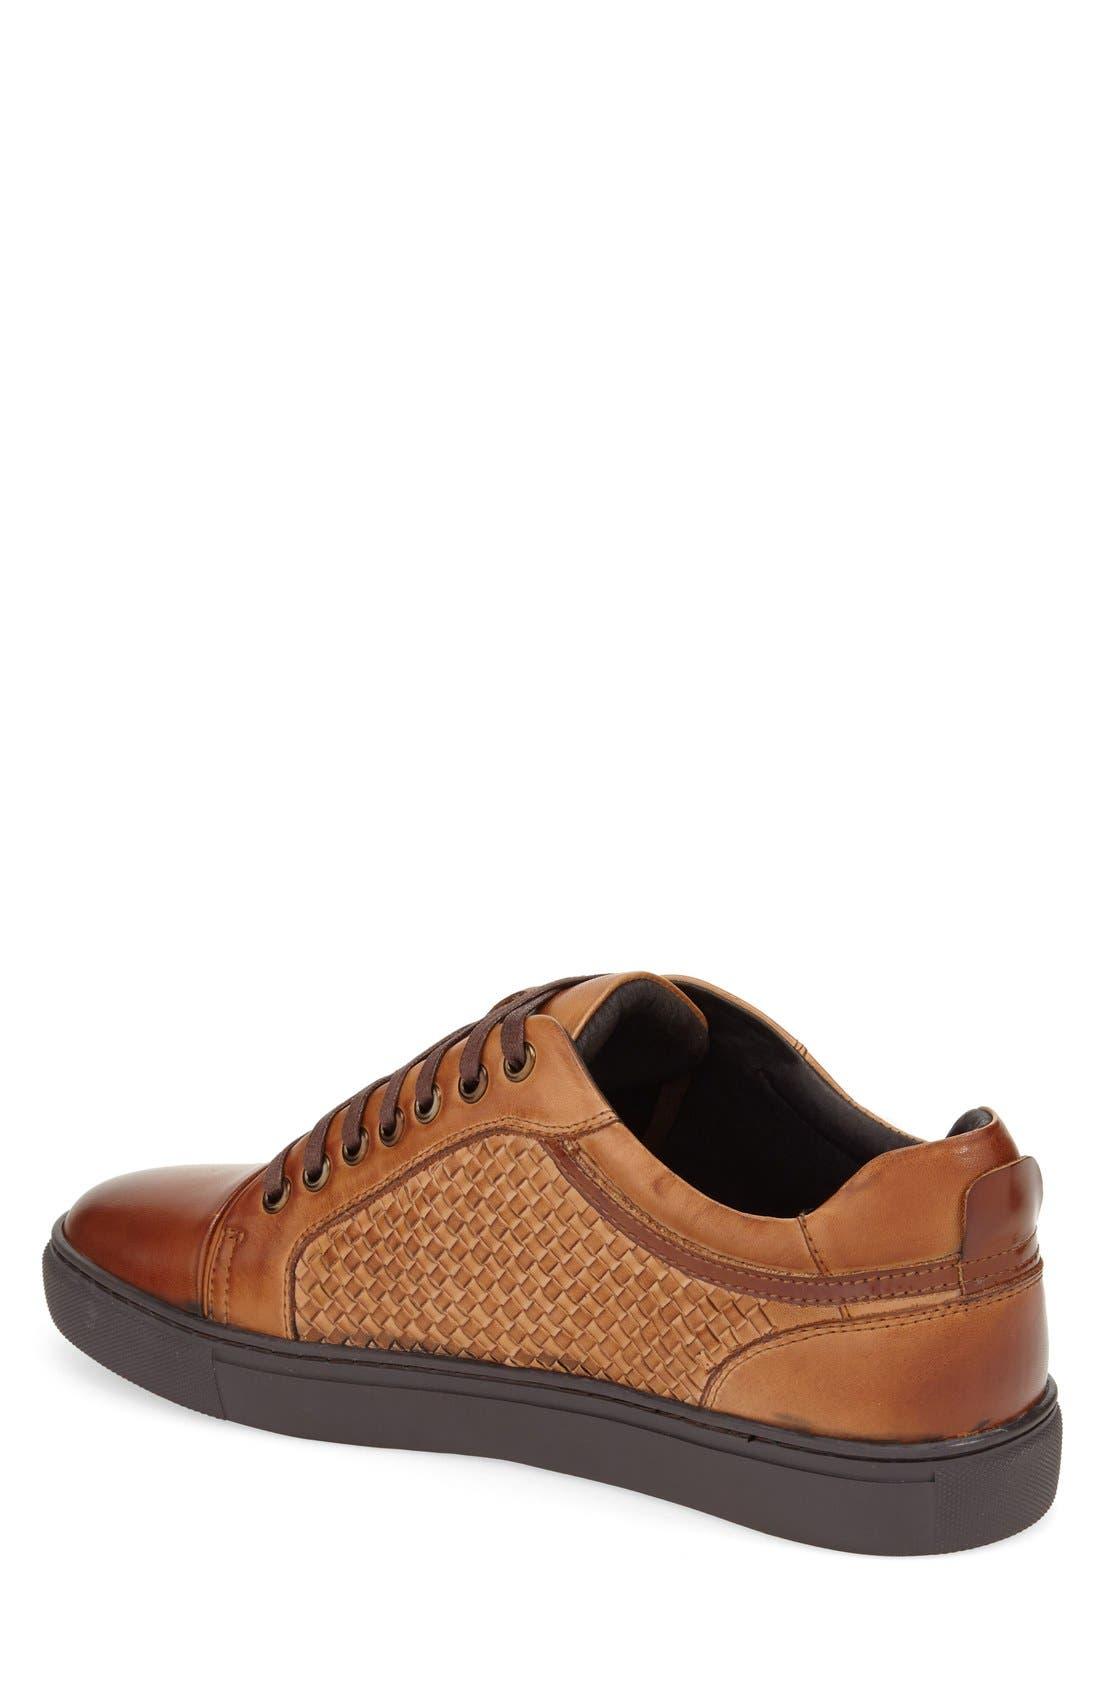 Alternate Image 2  - Zanzara 'Rhythm' Woven Sneaker (Men)